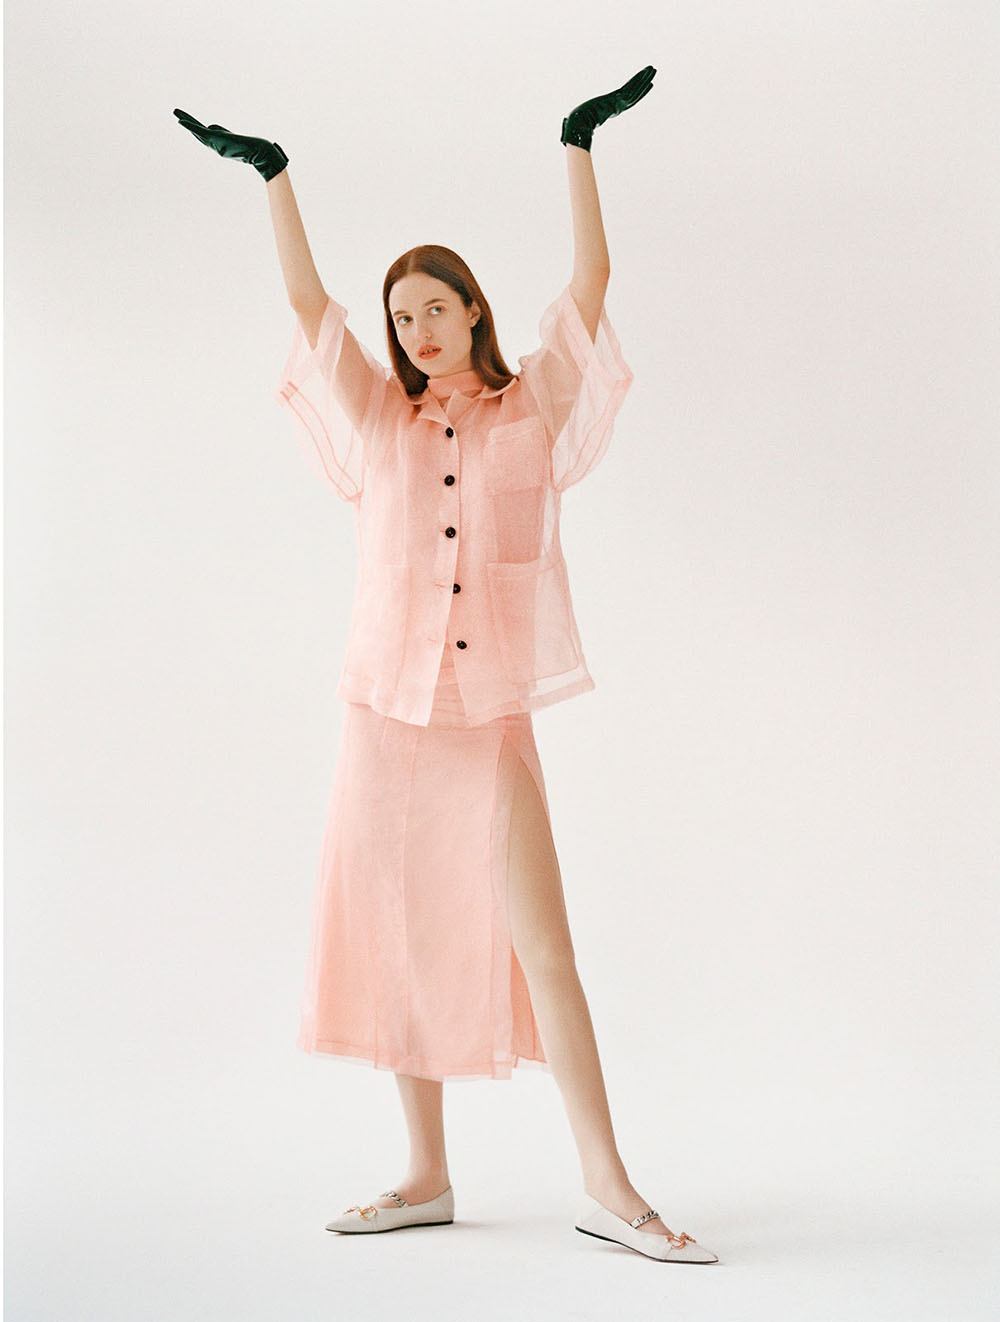 Julia Banas by Arseny Jabiev for Vogue Hong Kong March 2020